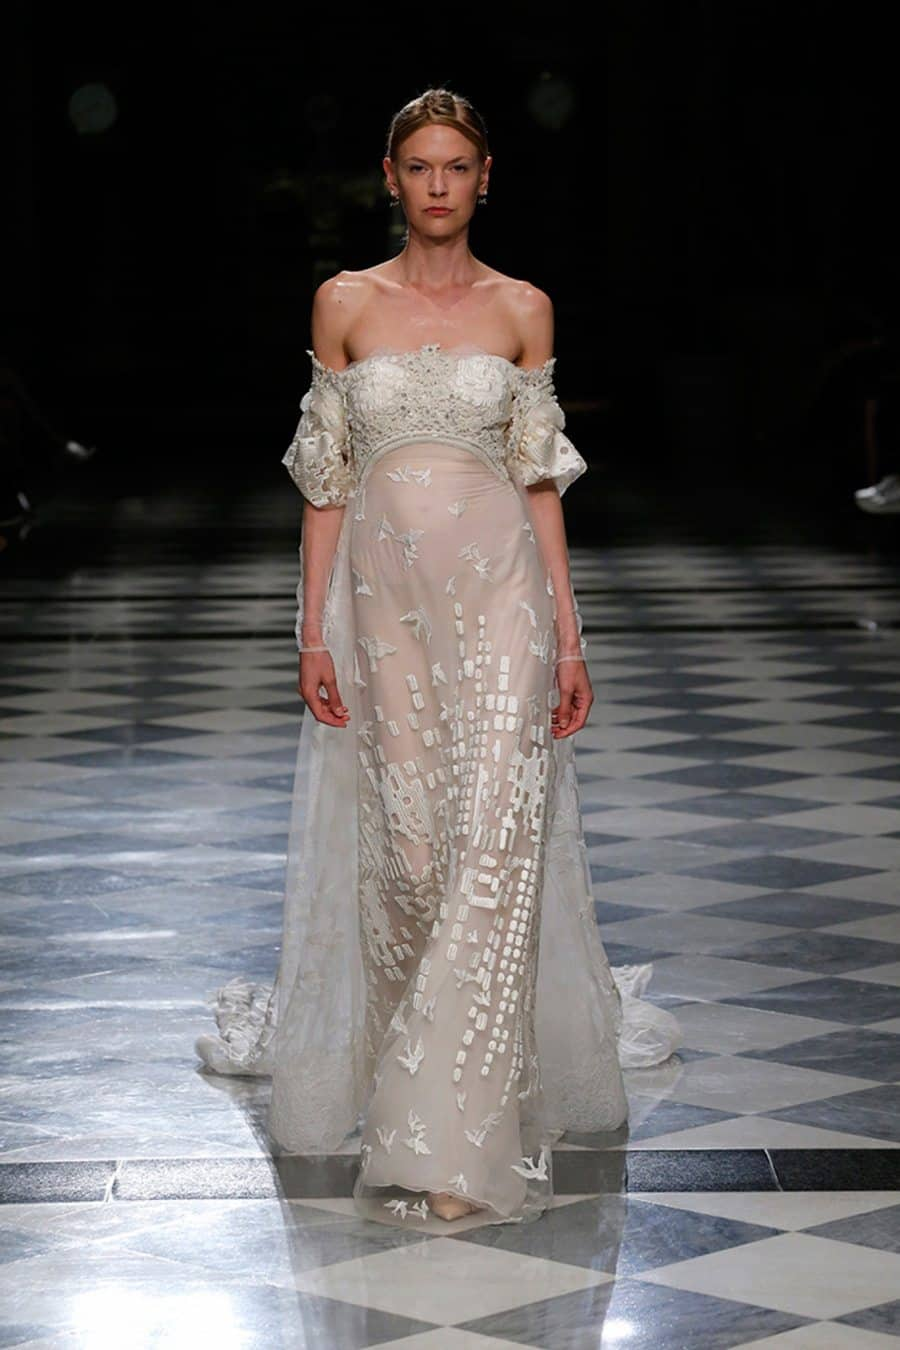 bride-high-fashion-couture-weddingdress-wedding-bridedress-couturedress-highfashion-yolancris-45